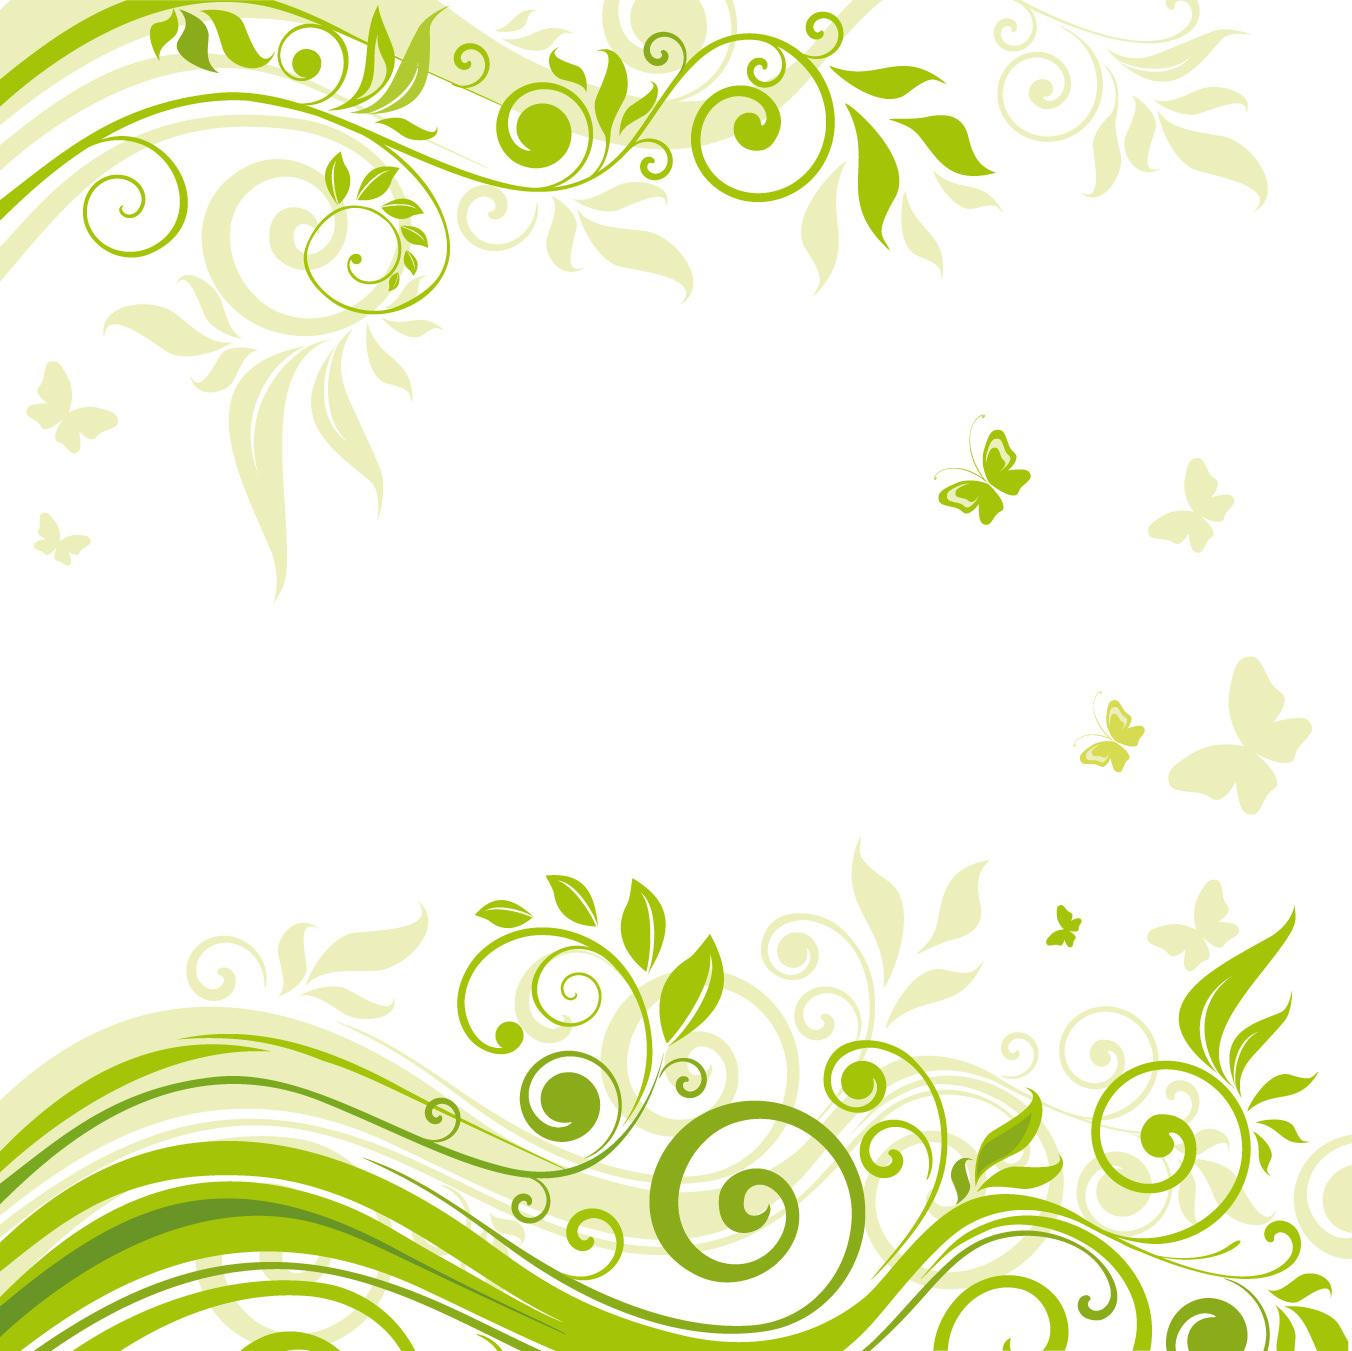 Hoa văn nền cây cỏ